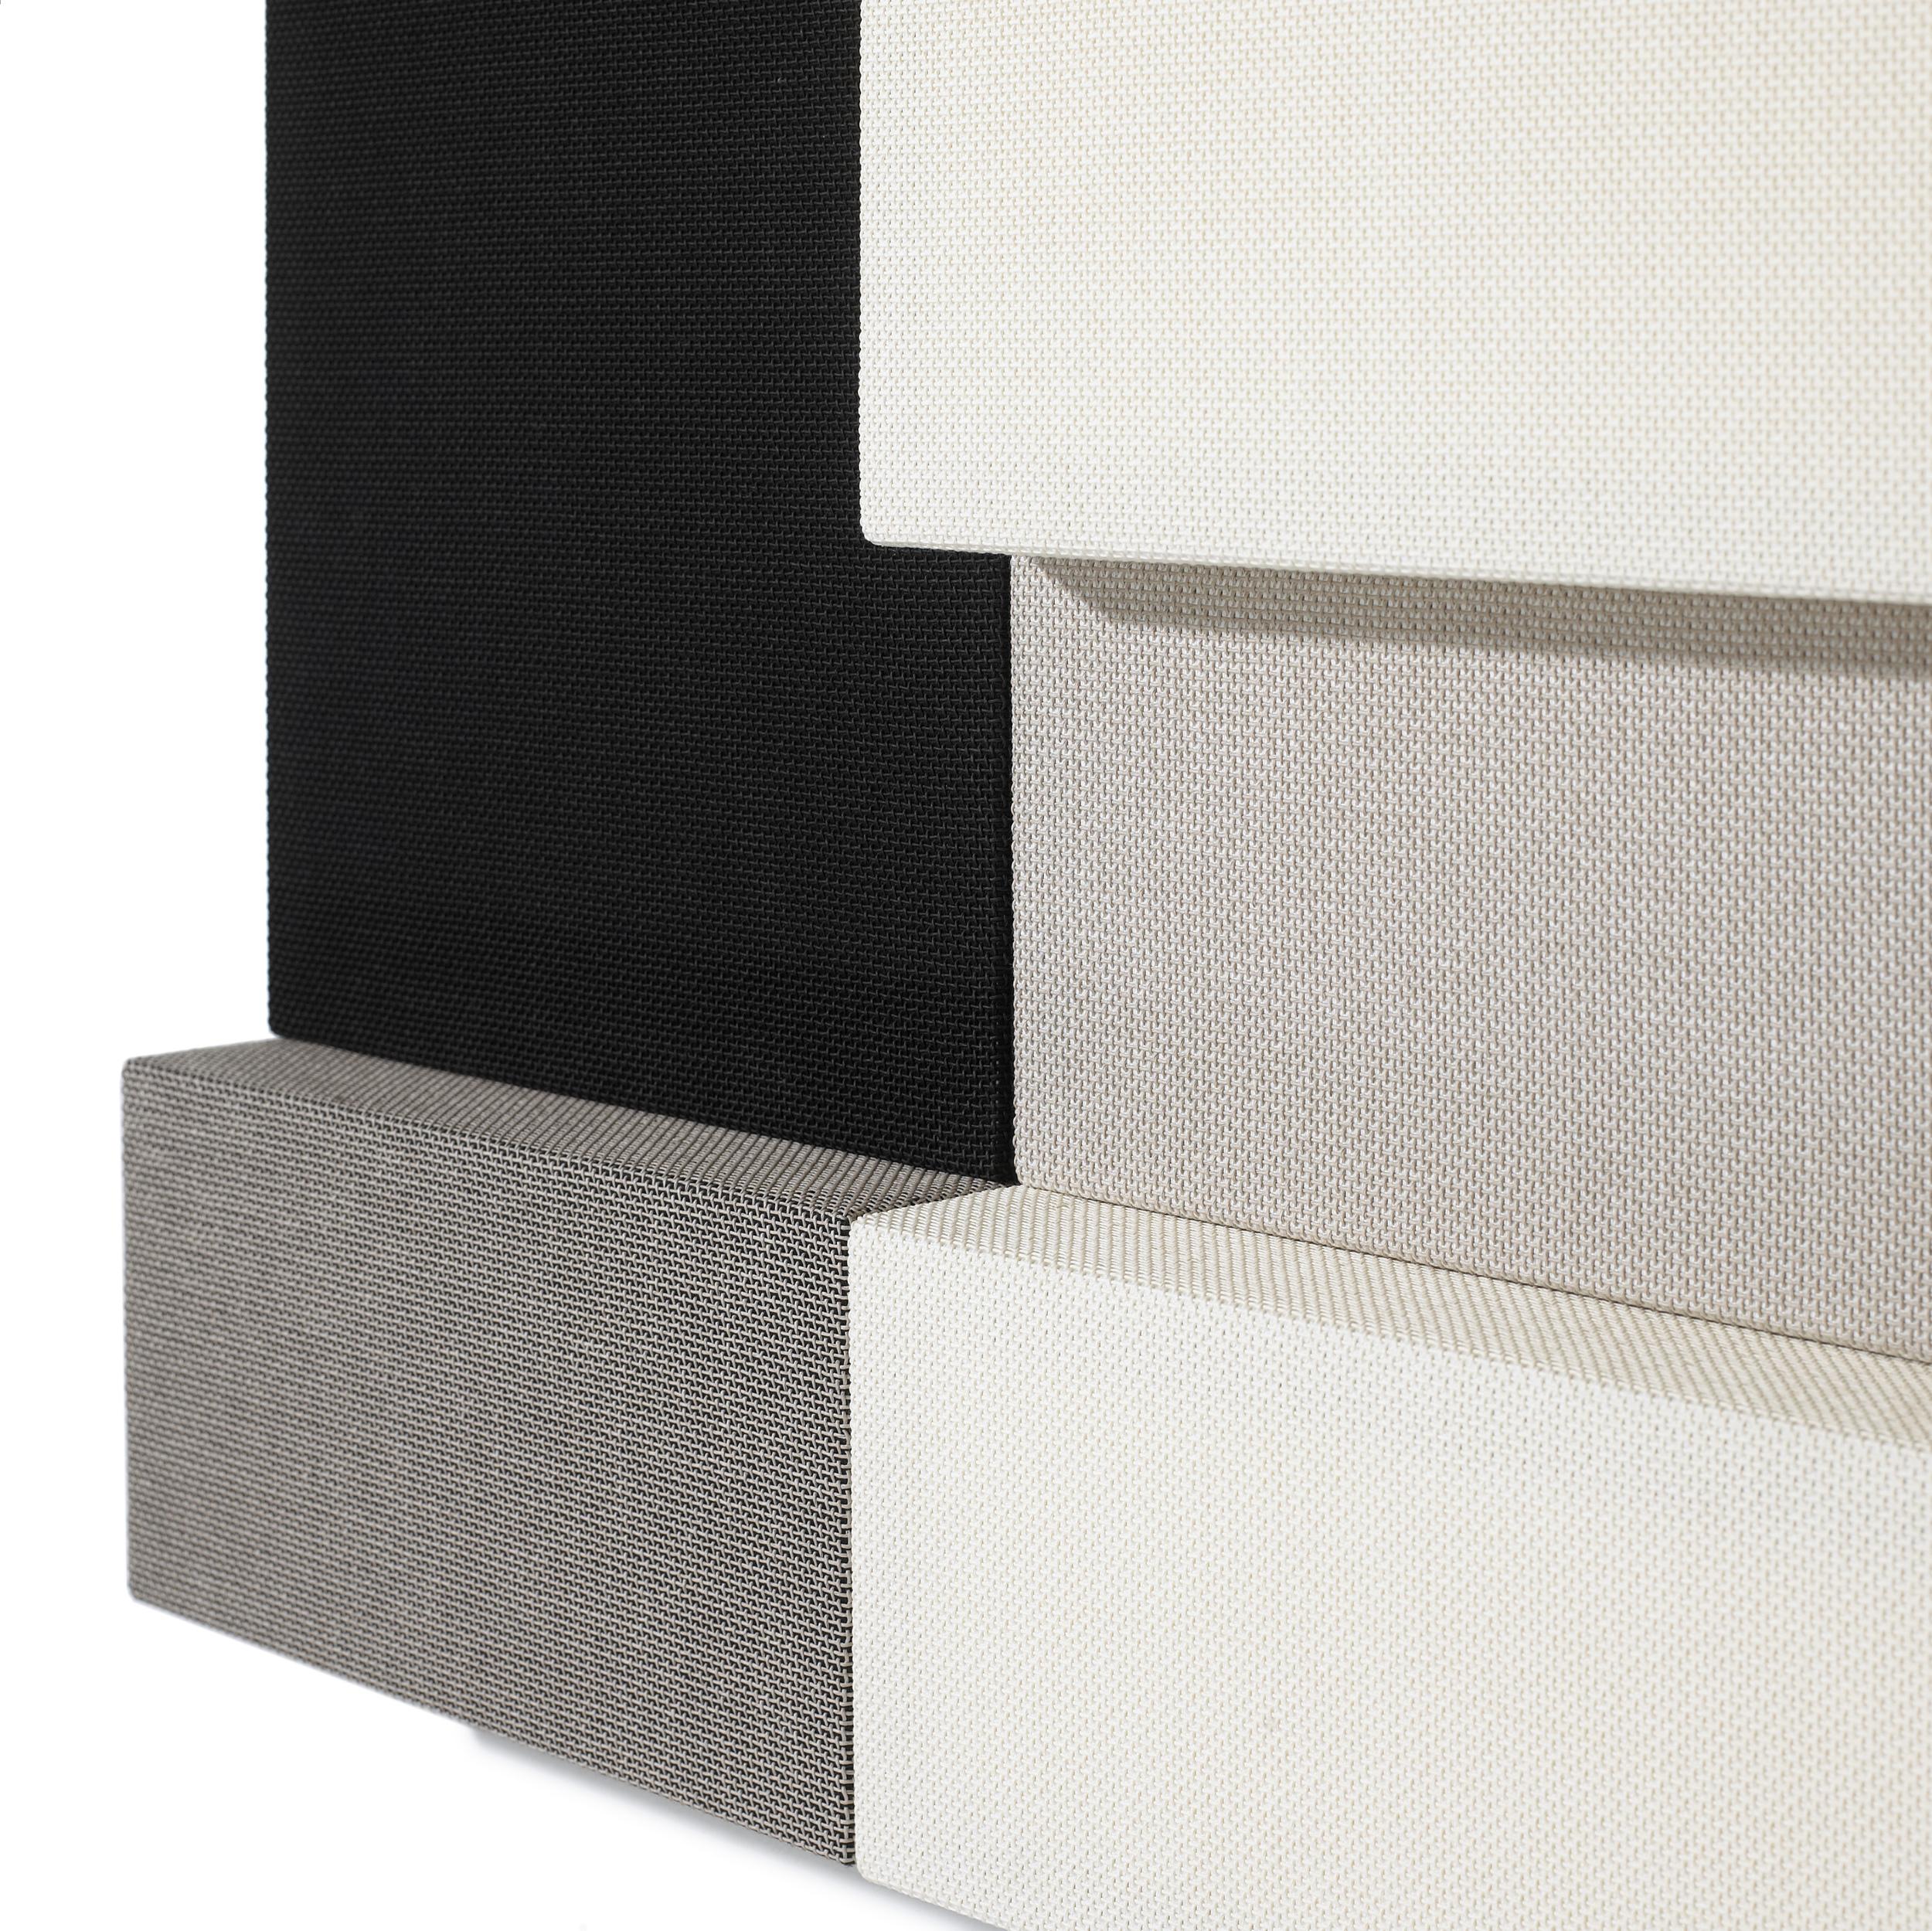 Whisper acoustic panels depth. 4 and 10 cm